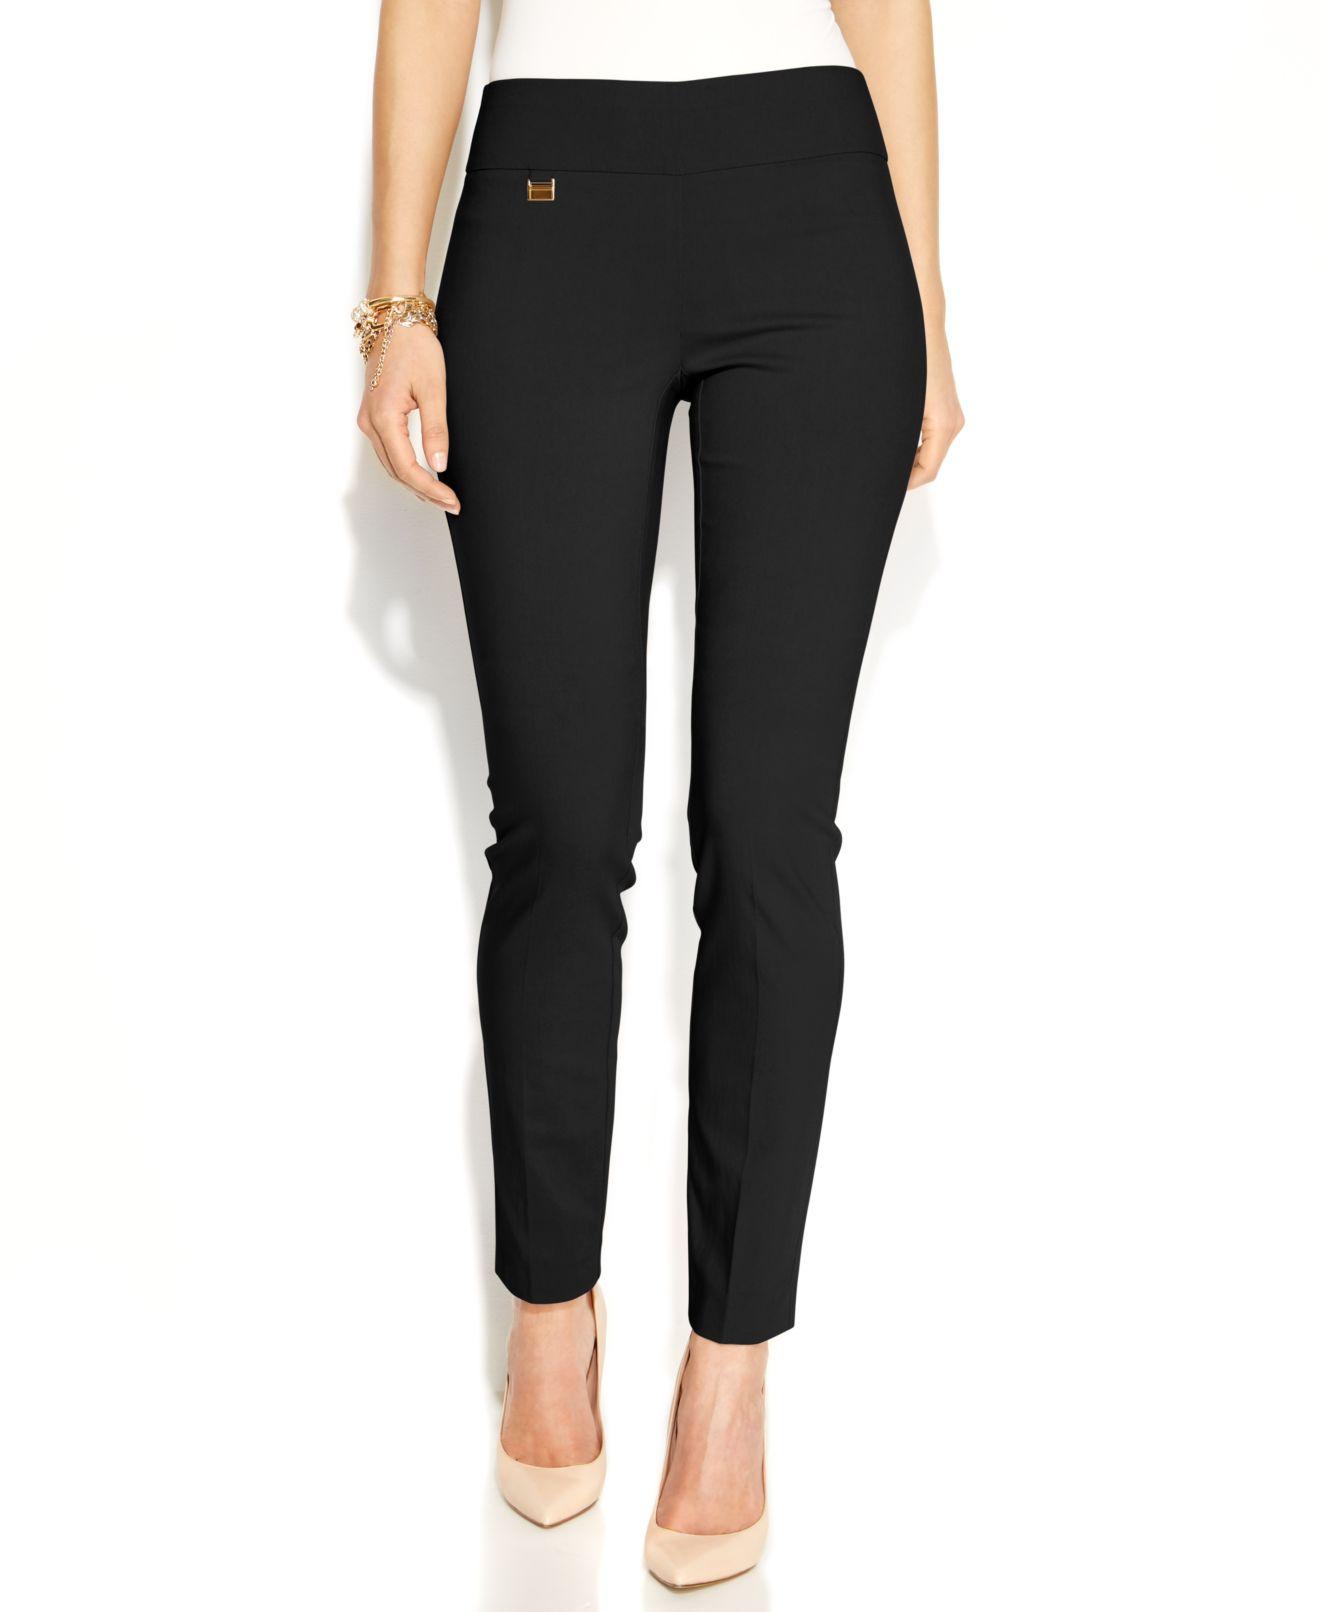 Dress Pants For Women